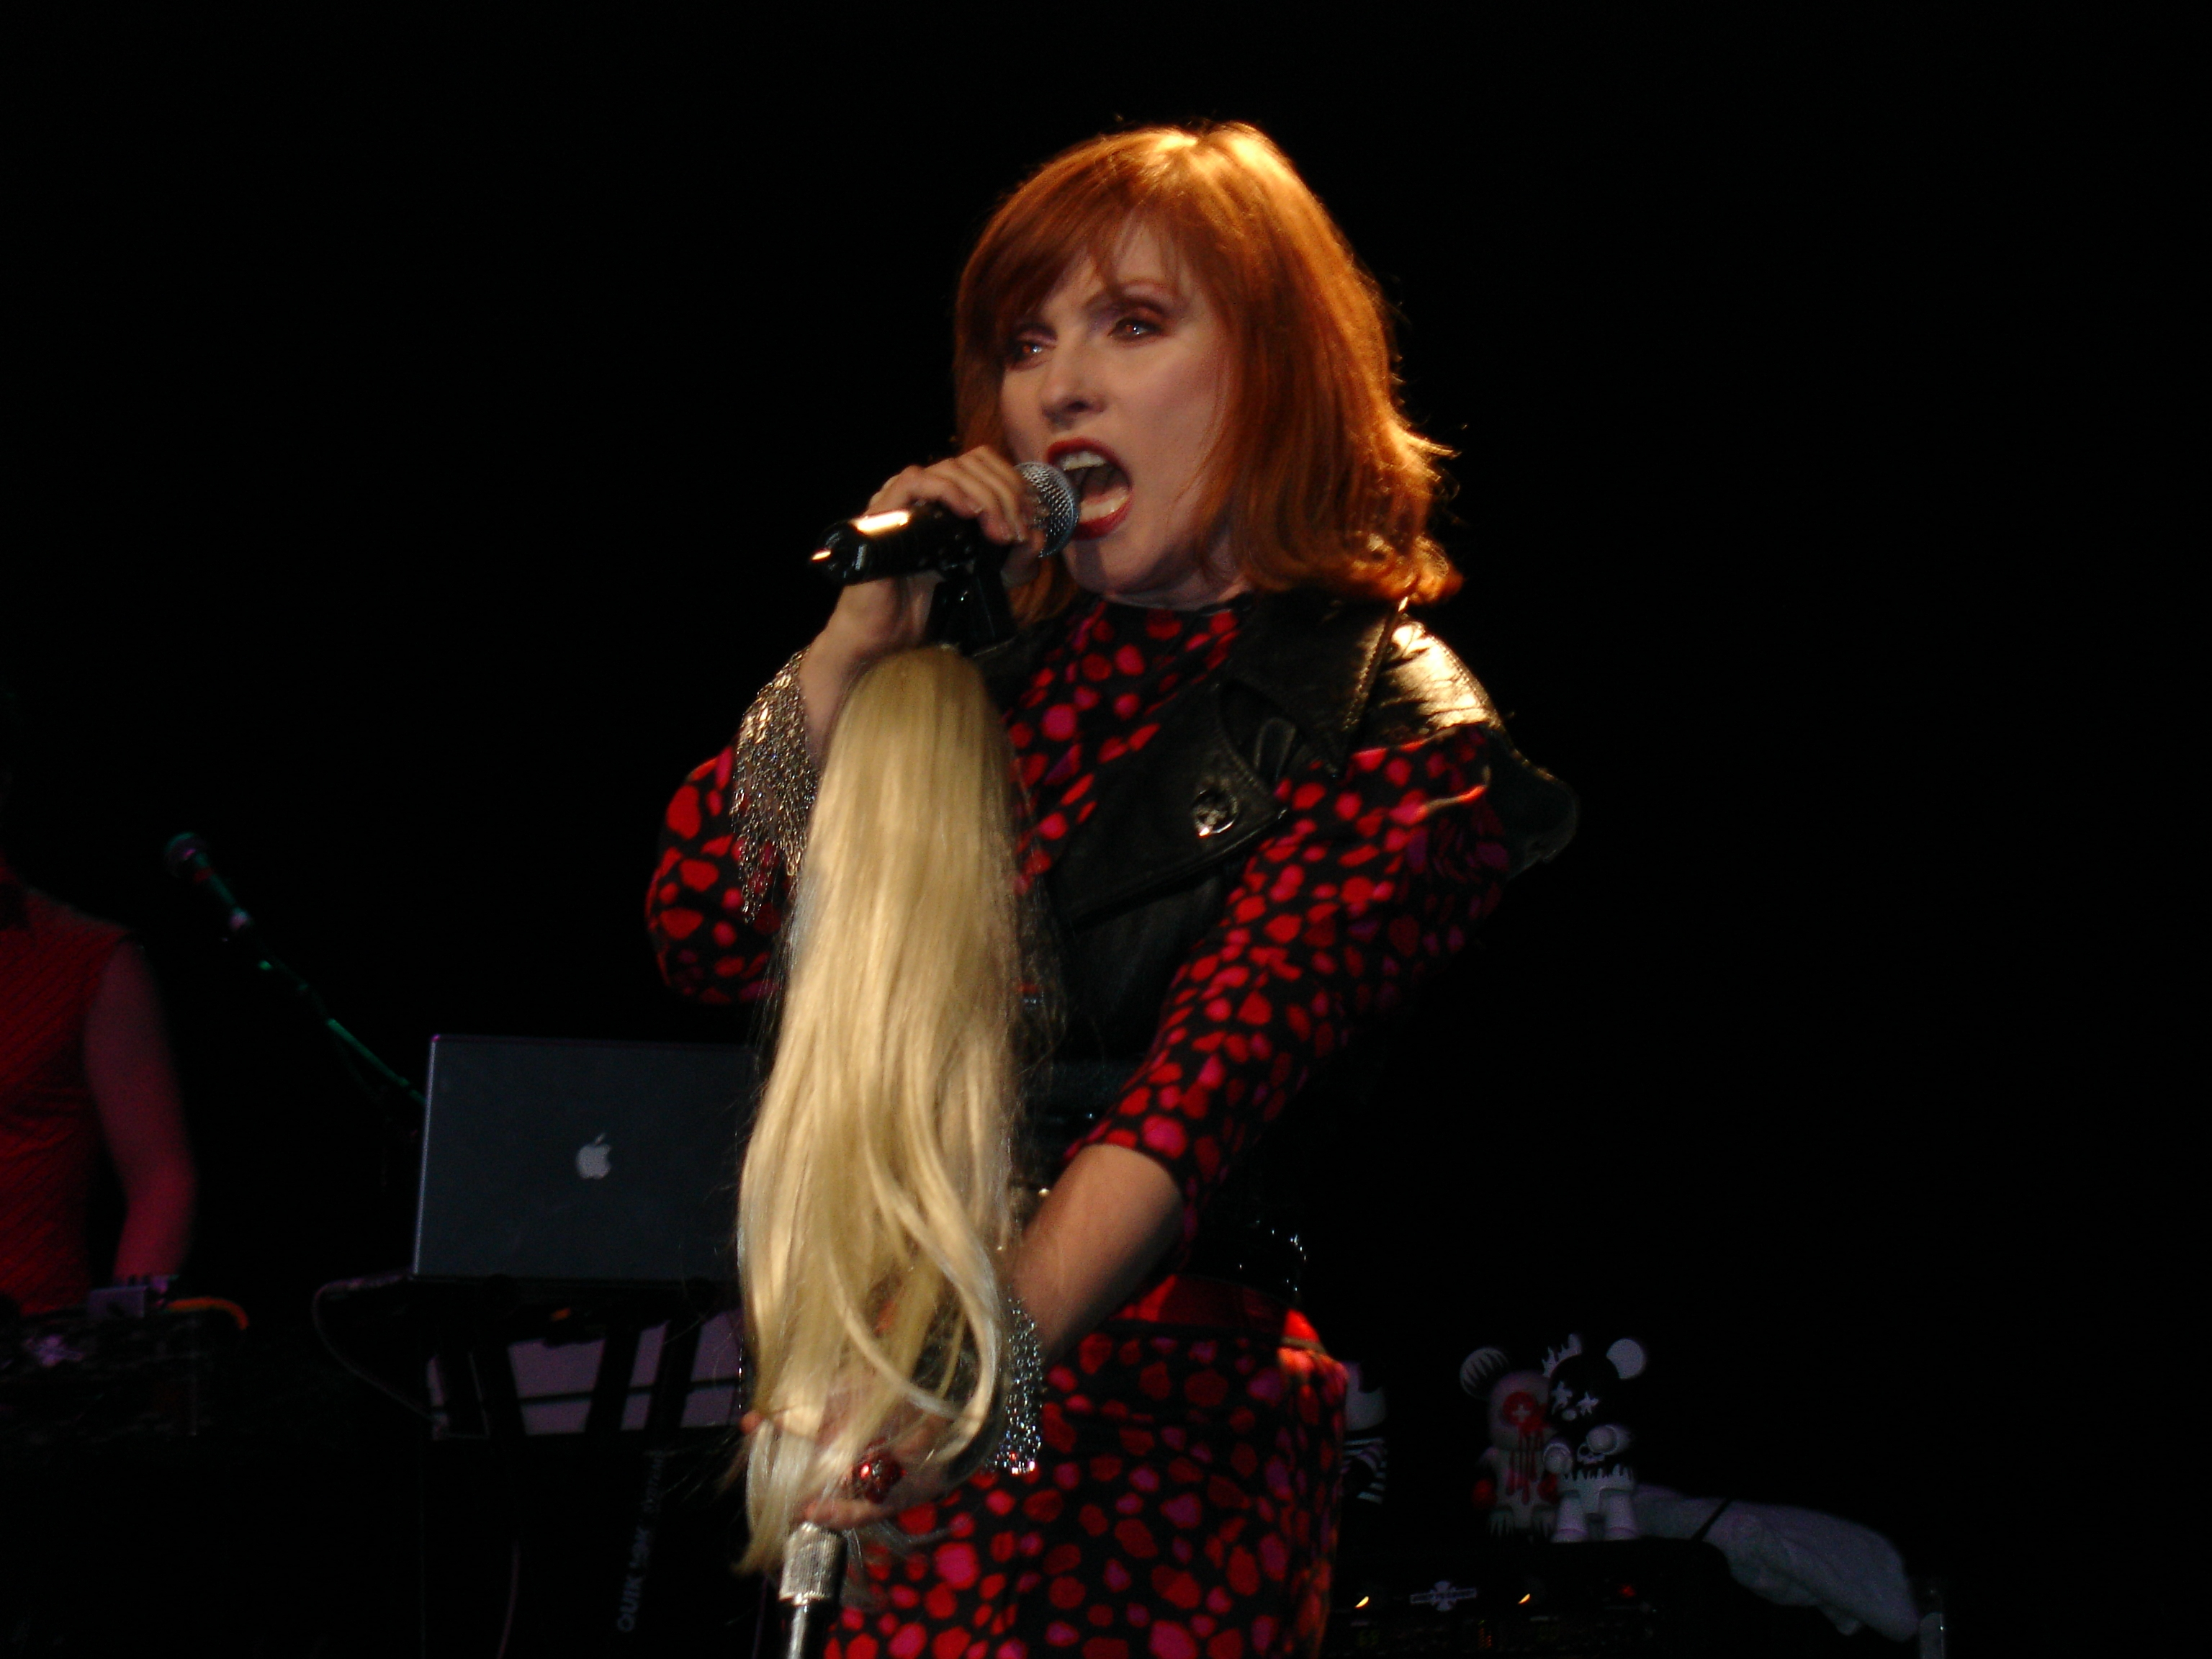 Blondie Band Blondie (band) - wikipedia